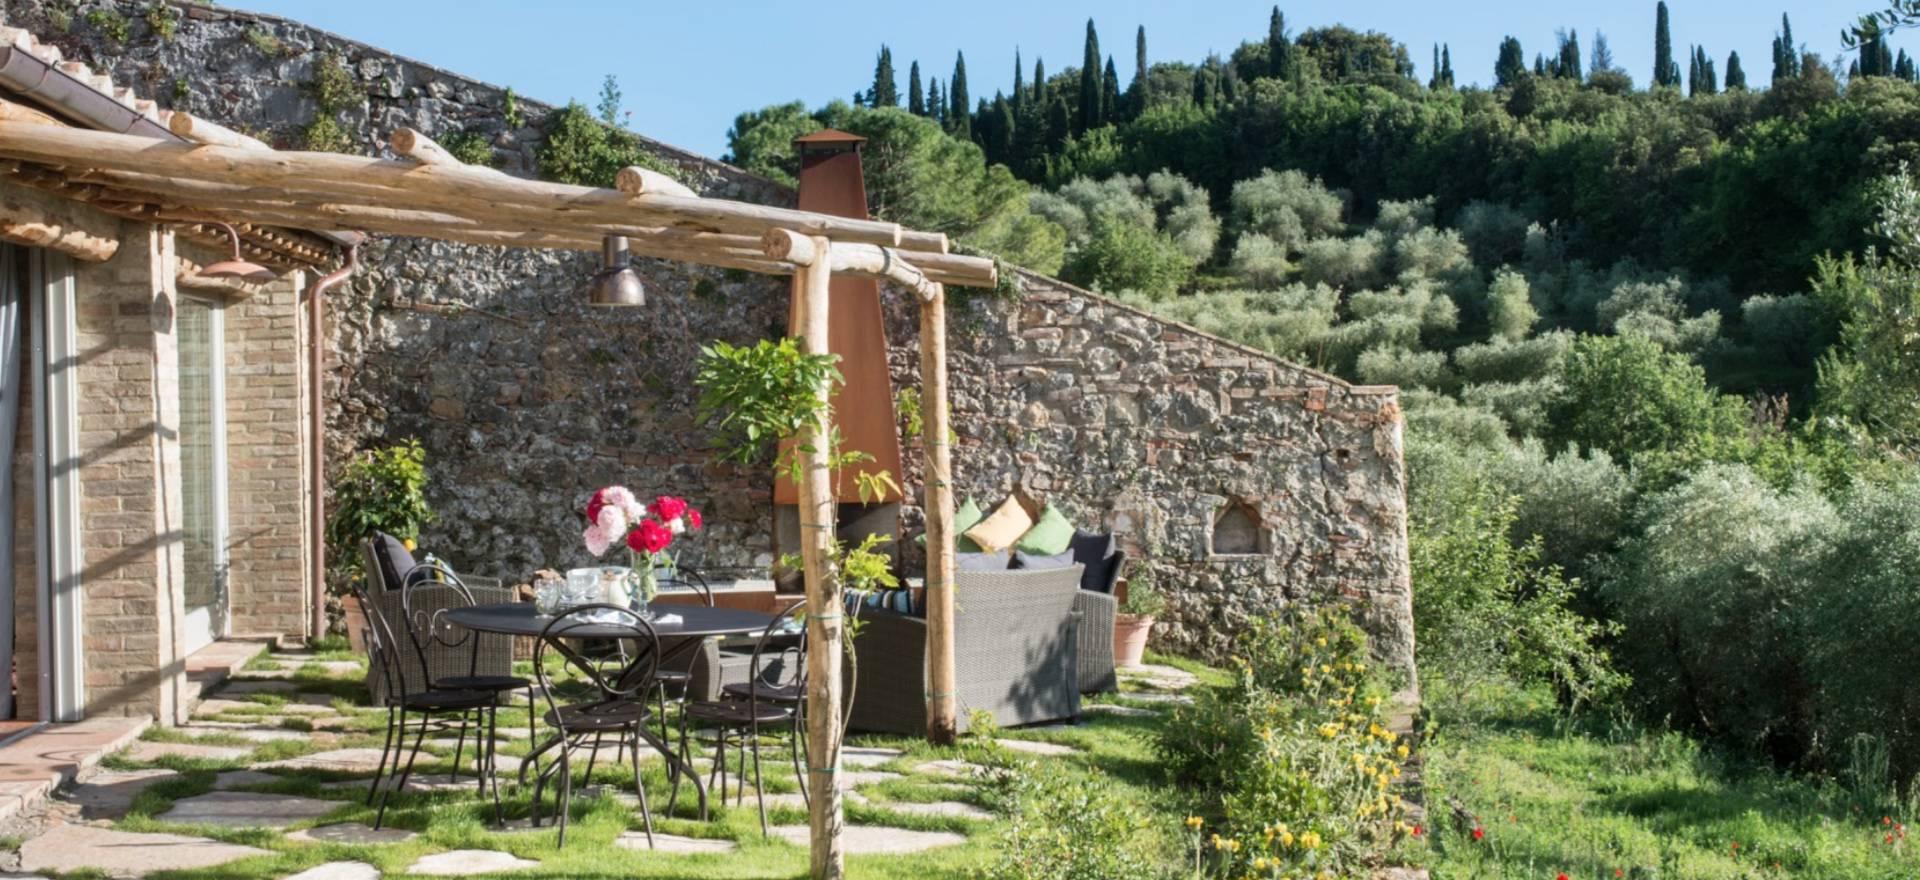 Agriturismo Toscana Perla nascosta in Toscana vicino a Siena